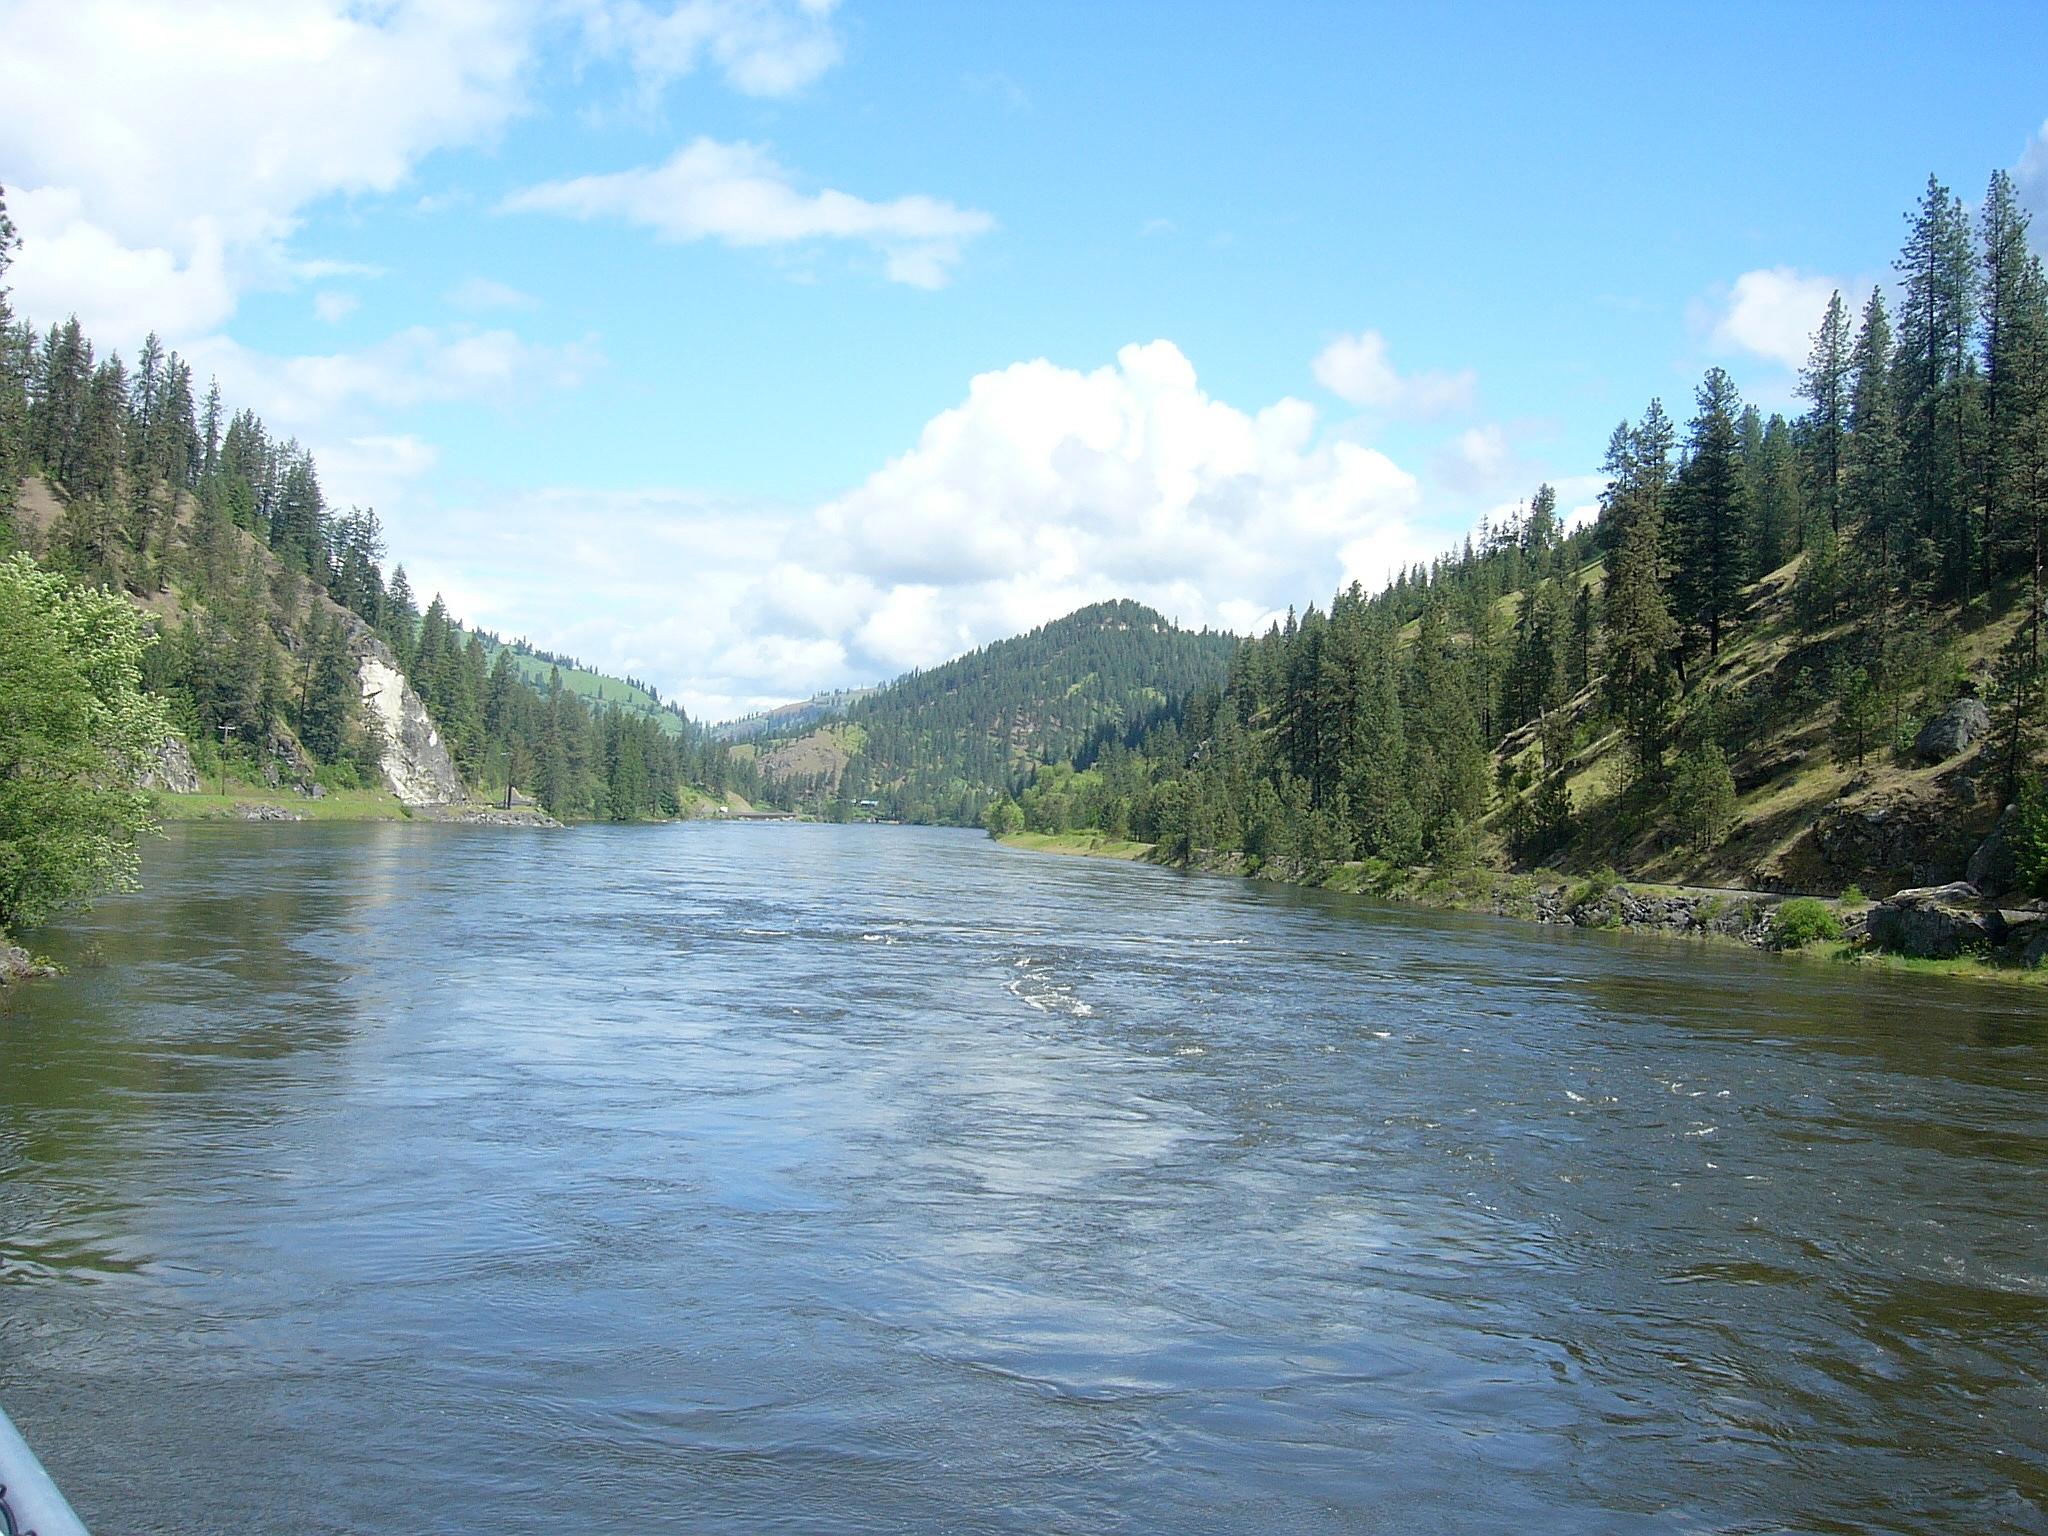 1_229_clearwater_river.jpg